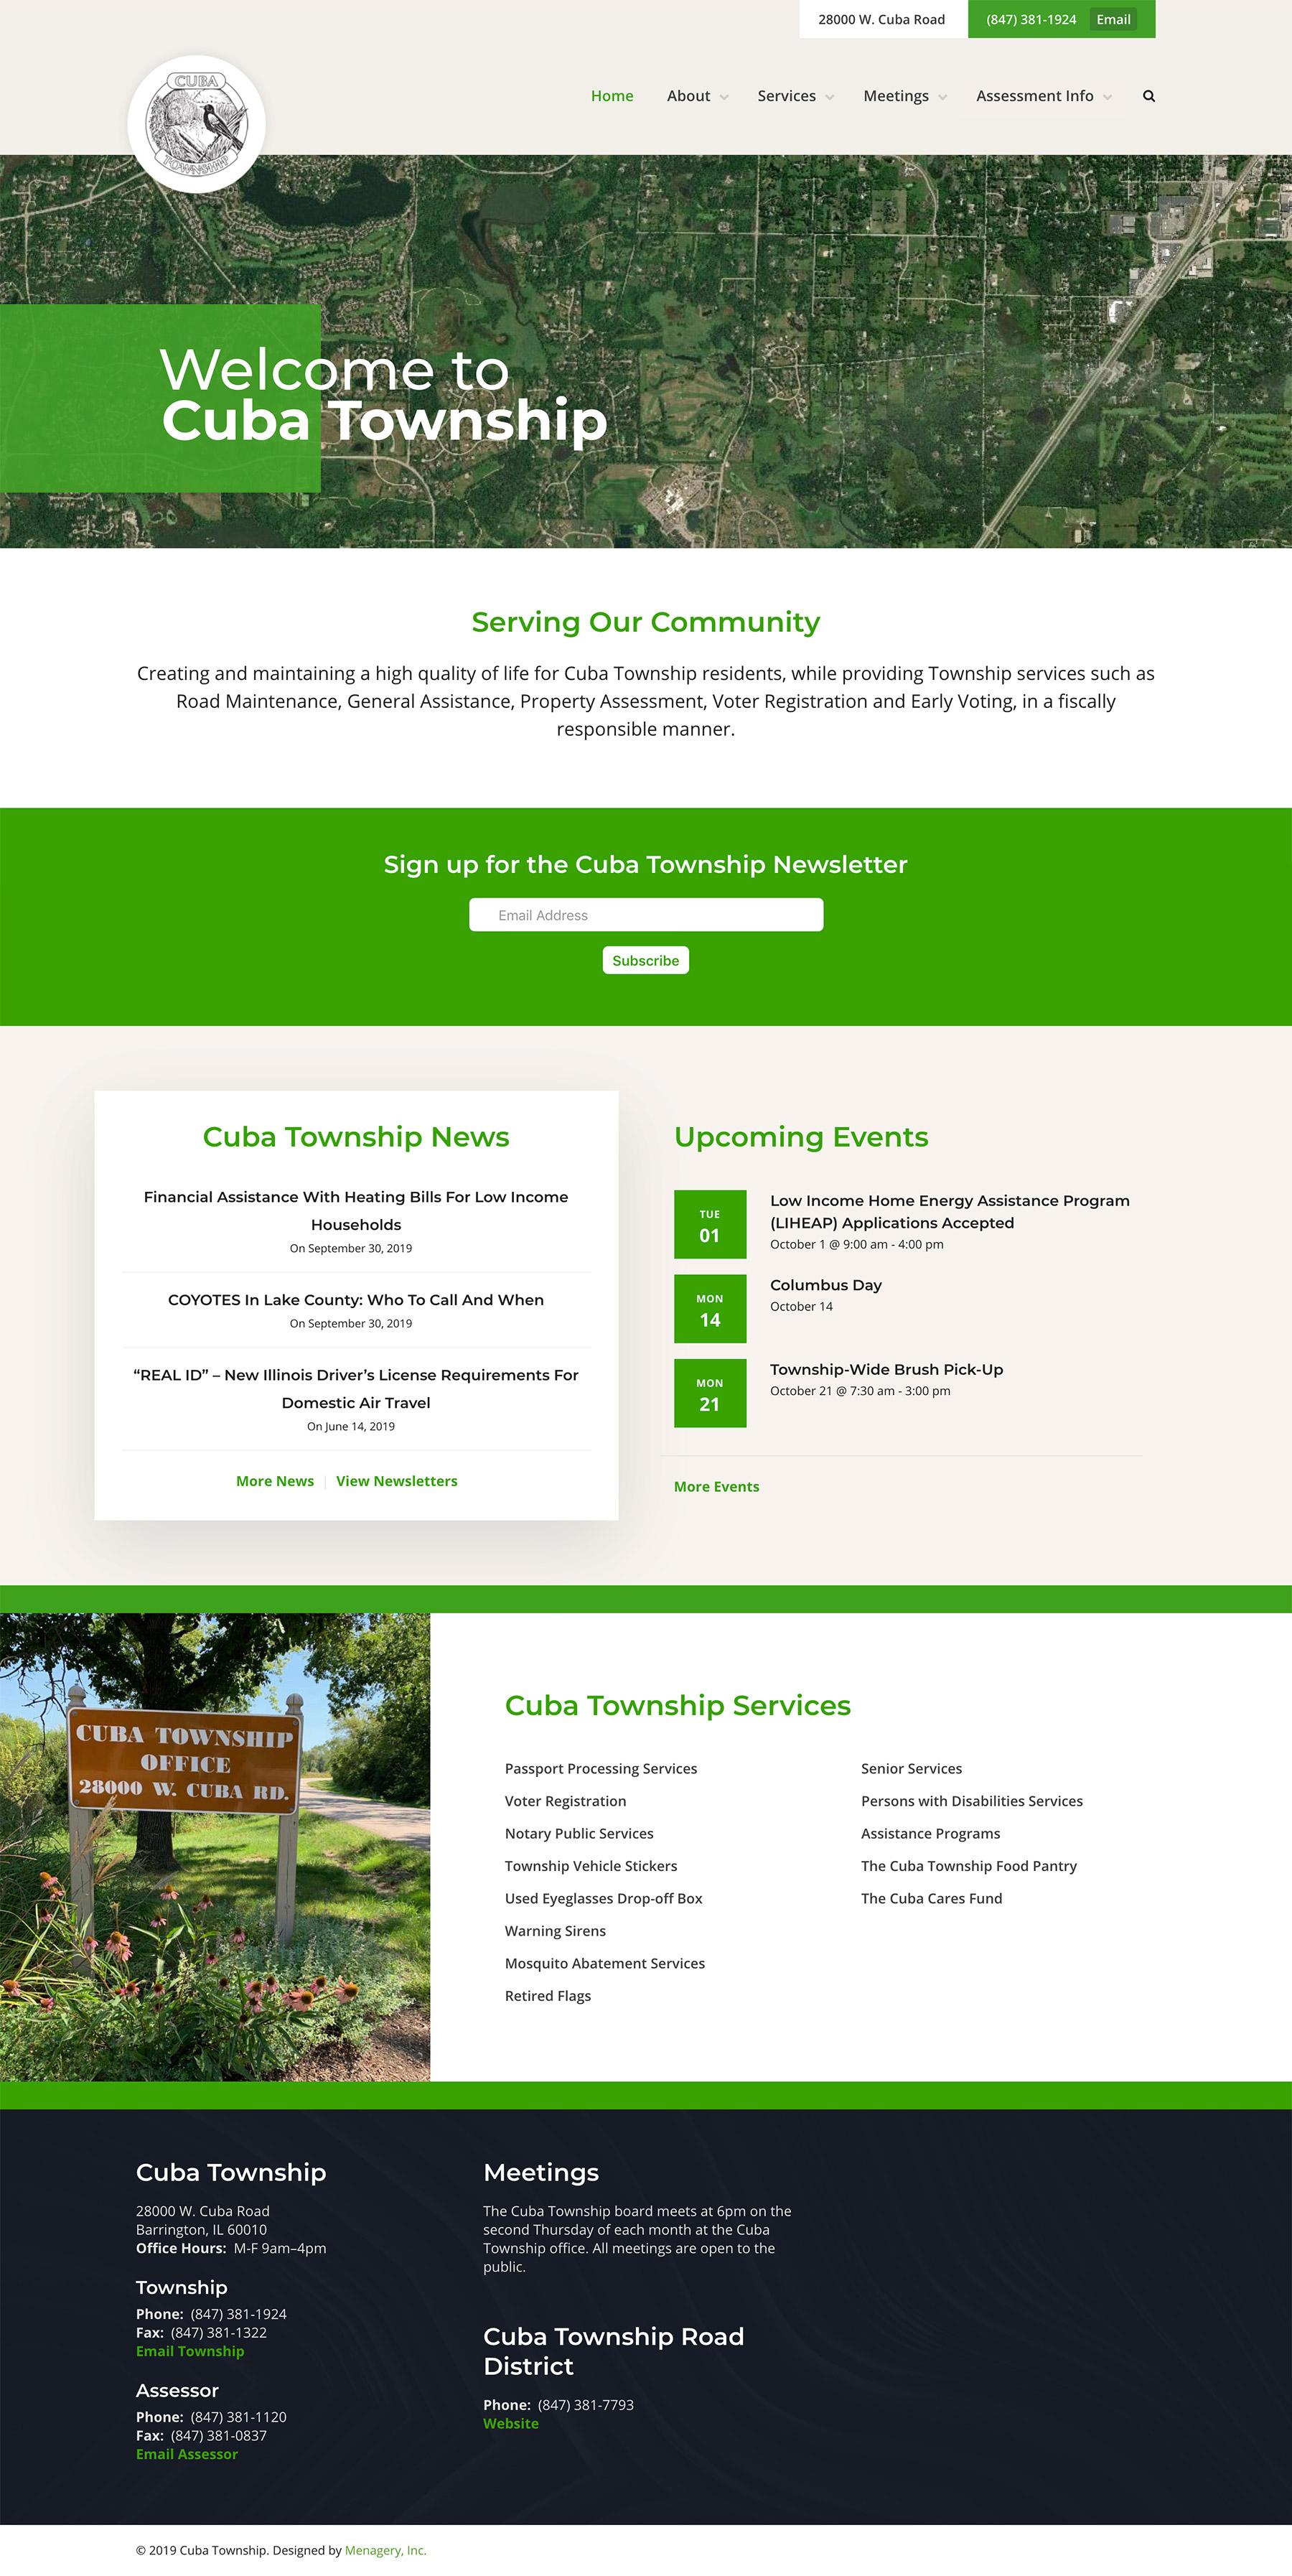 Cuba Township Homepage